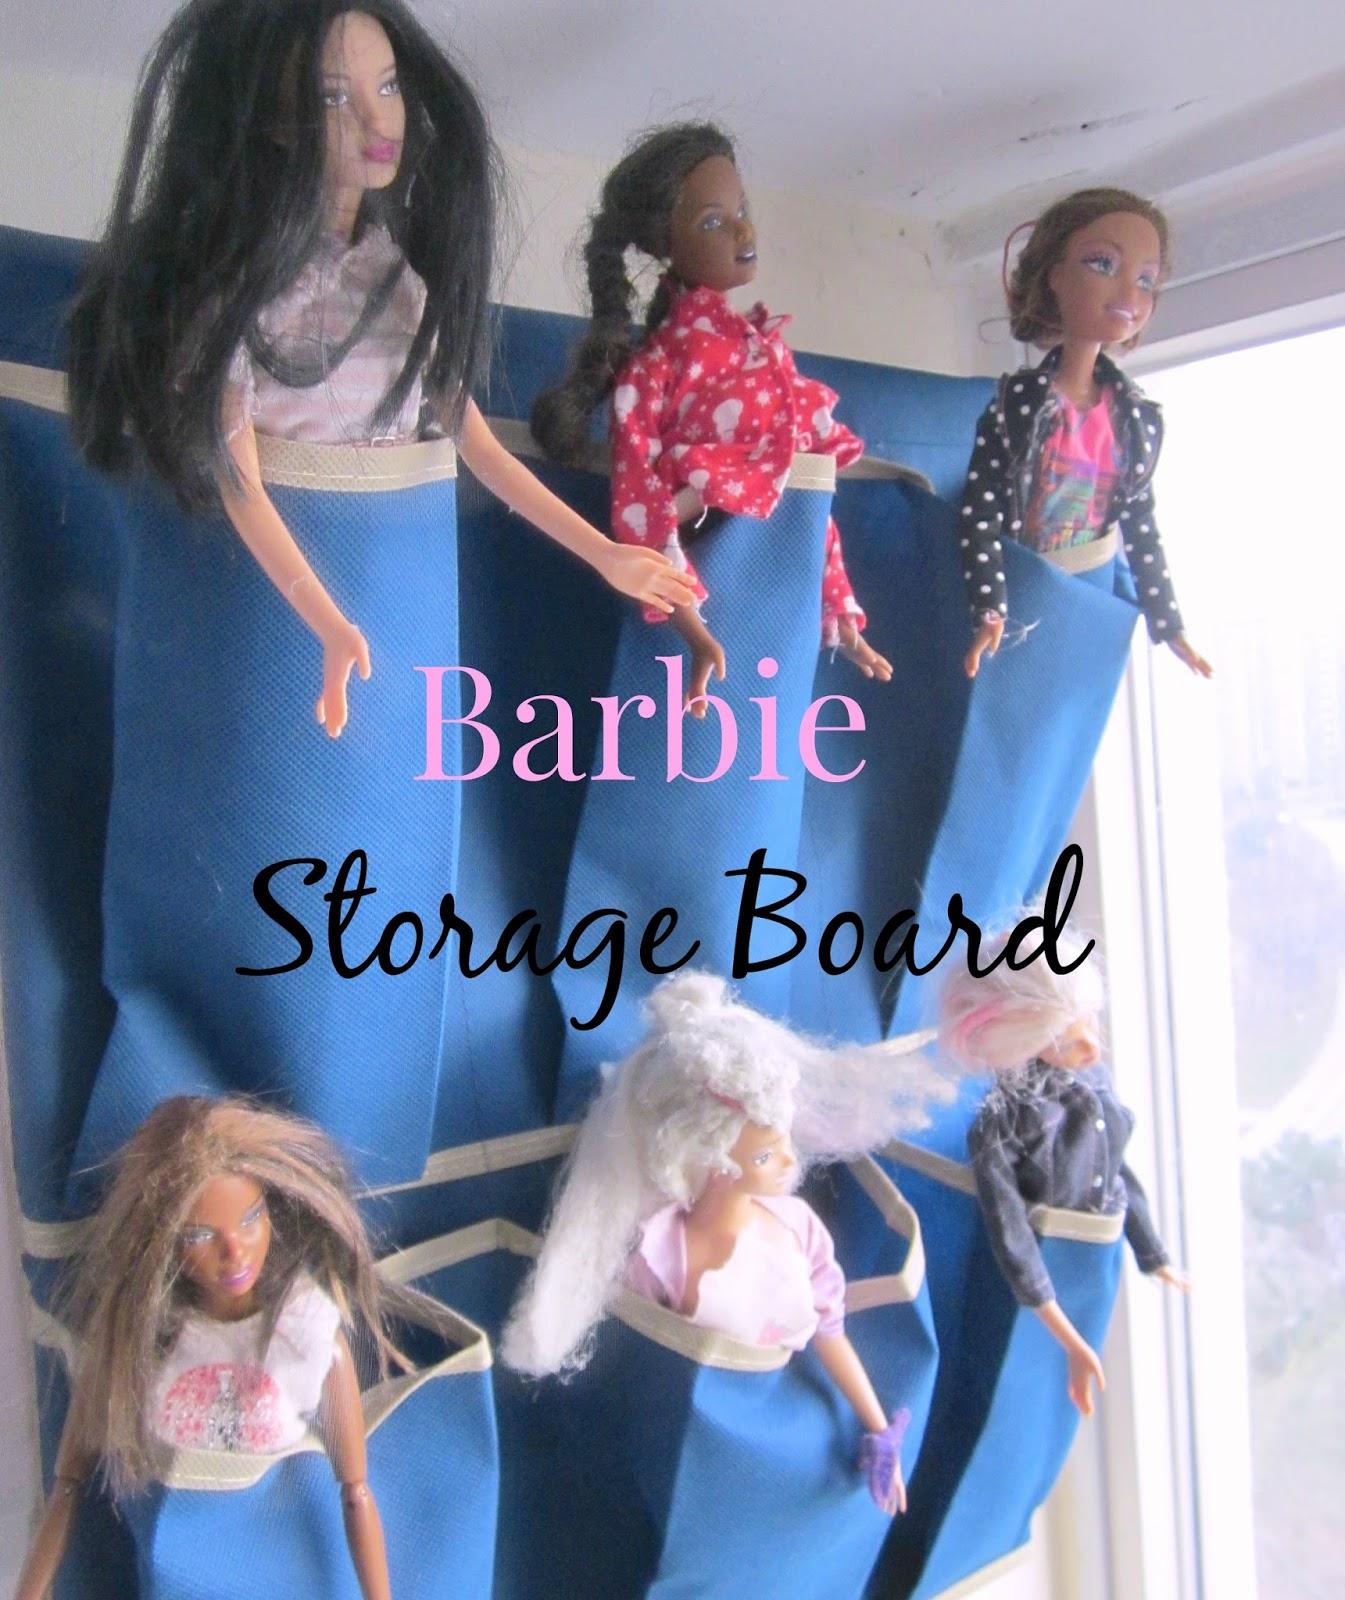 barbie storage board